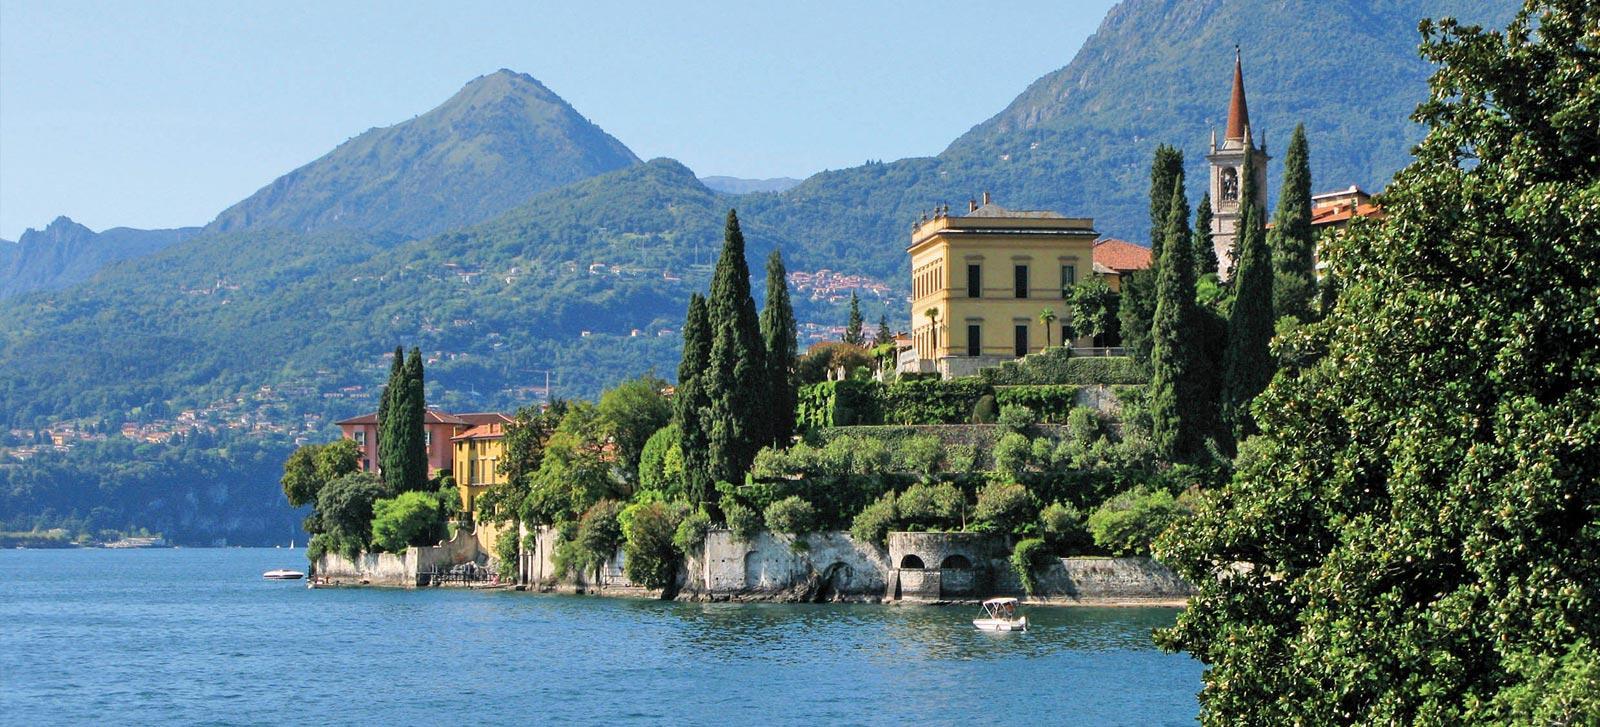 Гарда - самое чисто озеро в Европе (ФОТО)